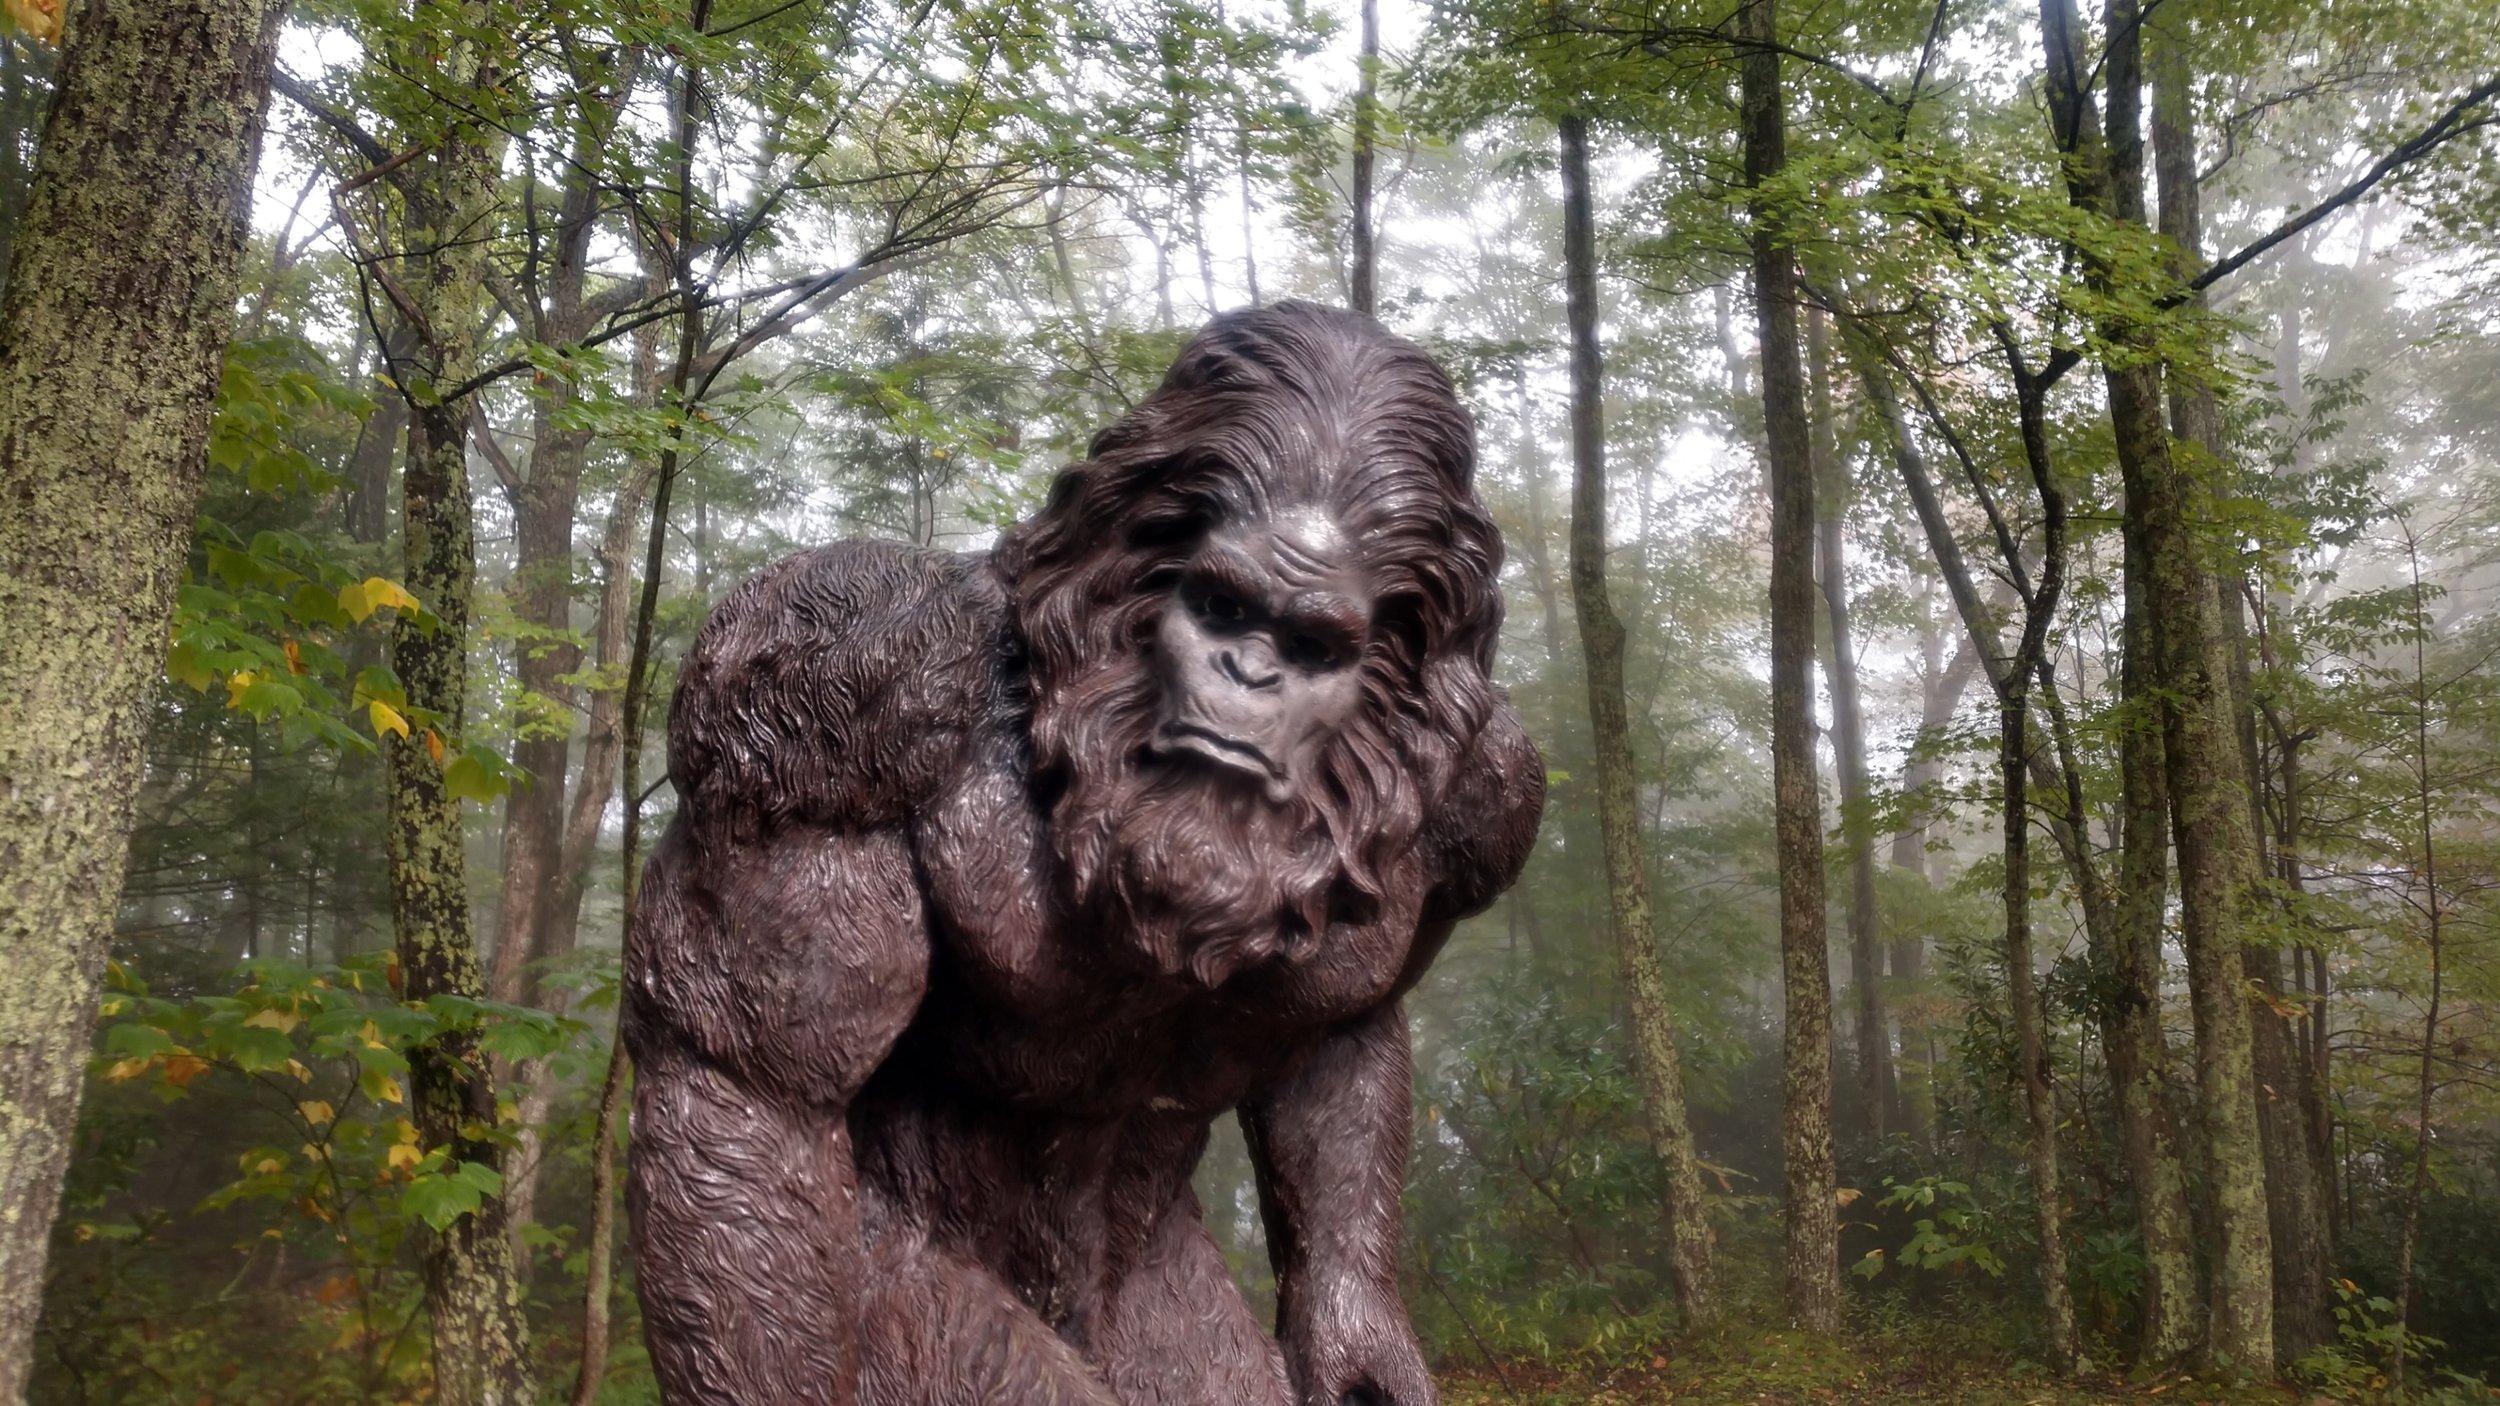 Woodbooger a.k.a. Bigfoot near Flag Rock in Norton, Virginia